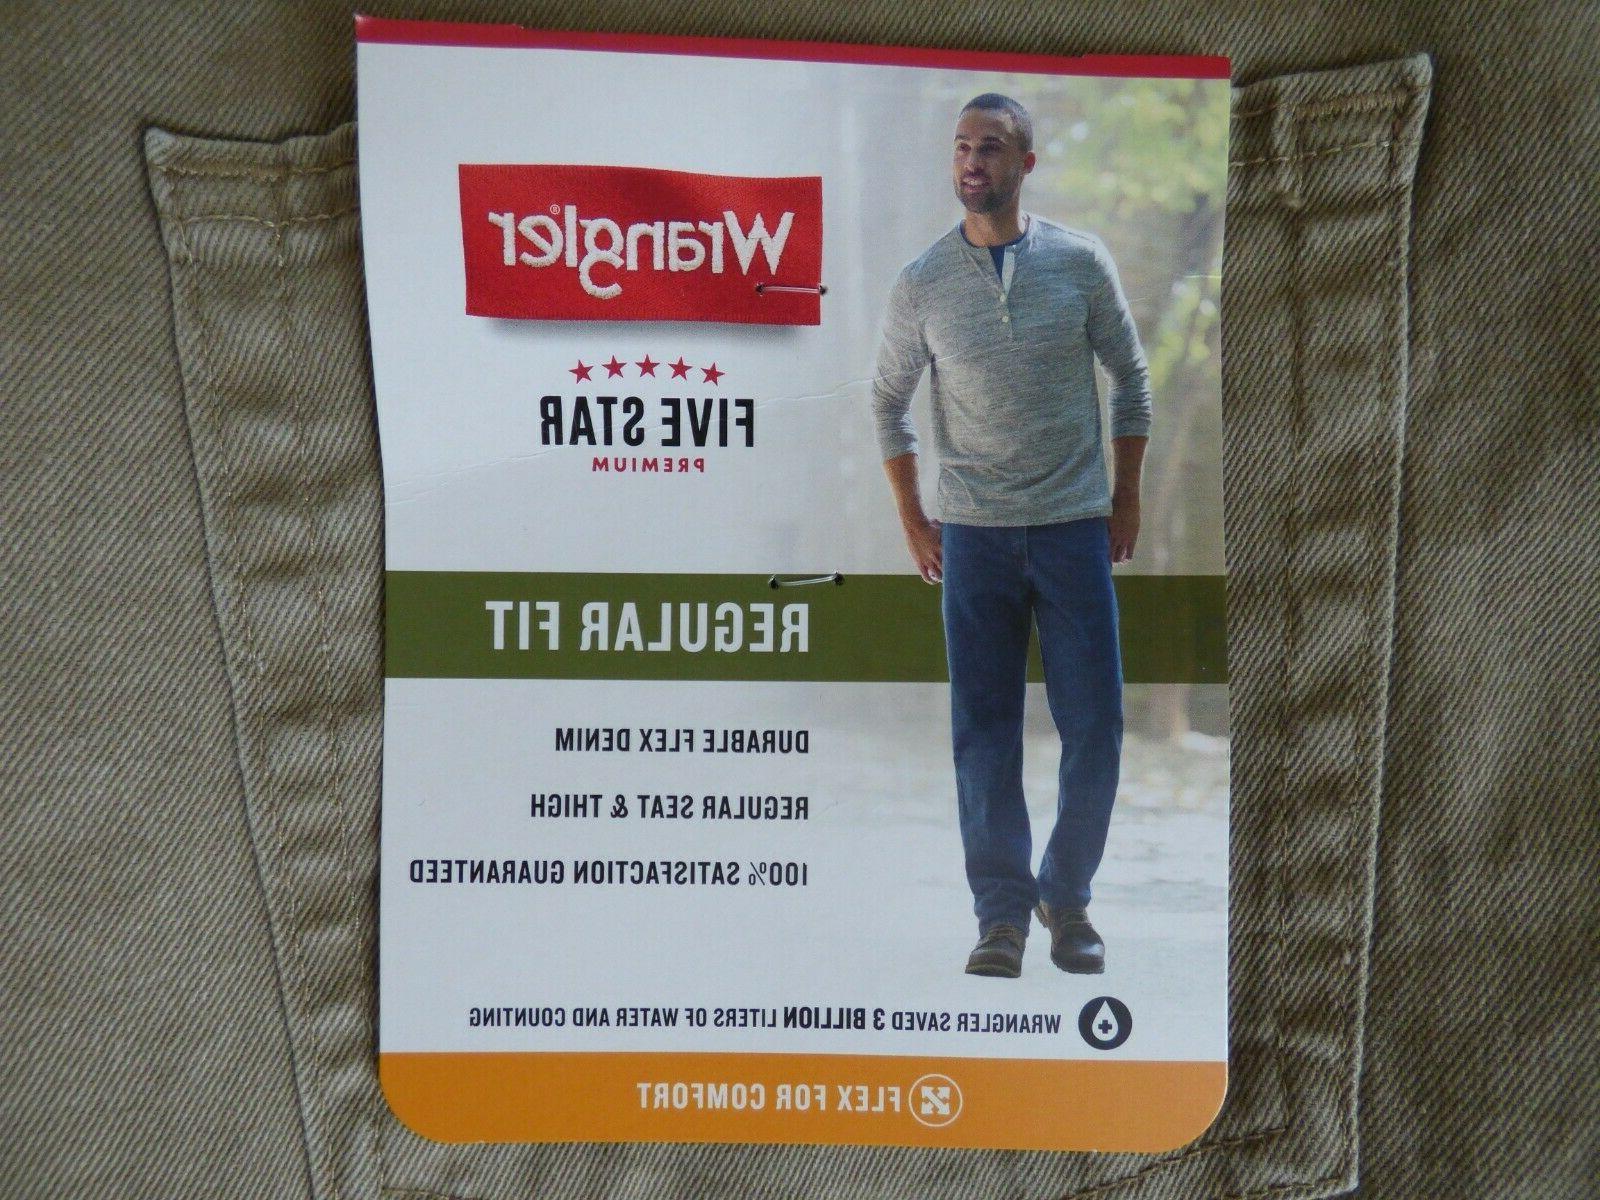 Wrangler 5 Star Regular Fit Jean with Flex Mens - Size W29 -